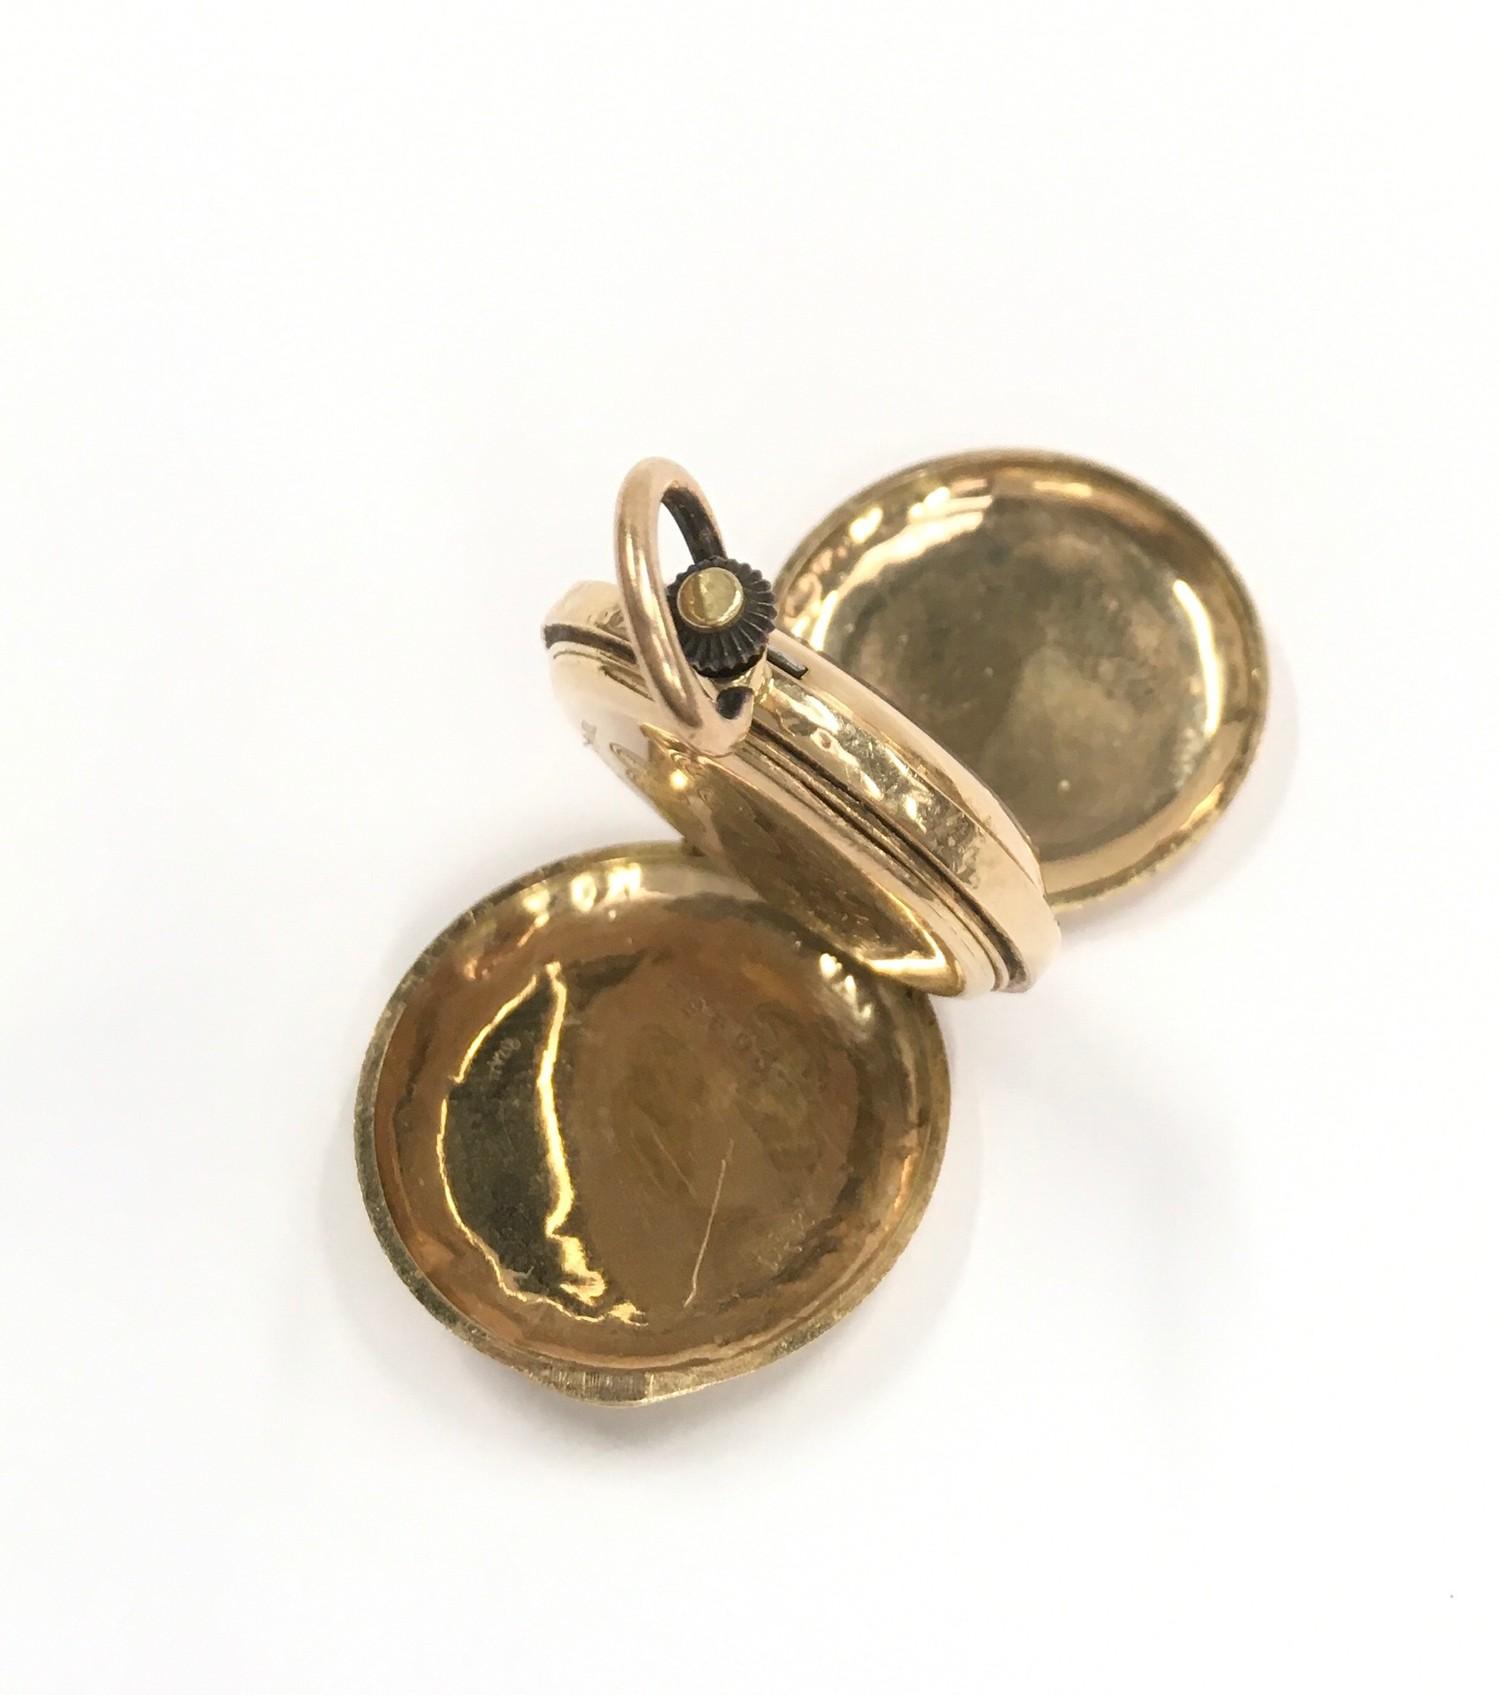 14ct Gold ladies Full Hunter pocket watch. - Image 4 of 6